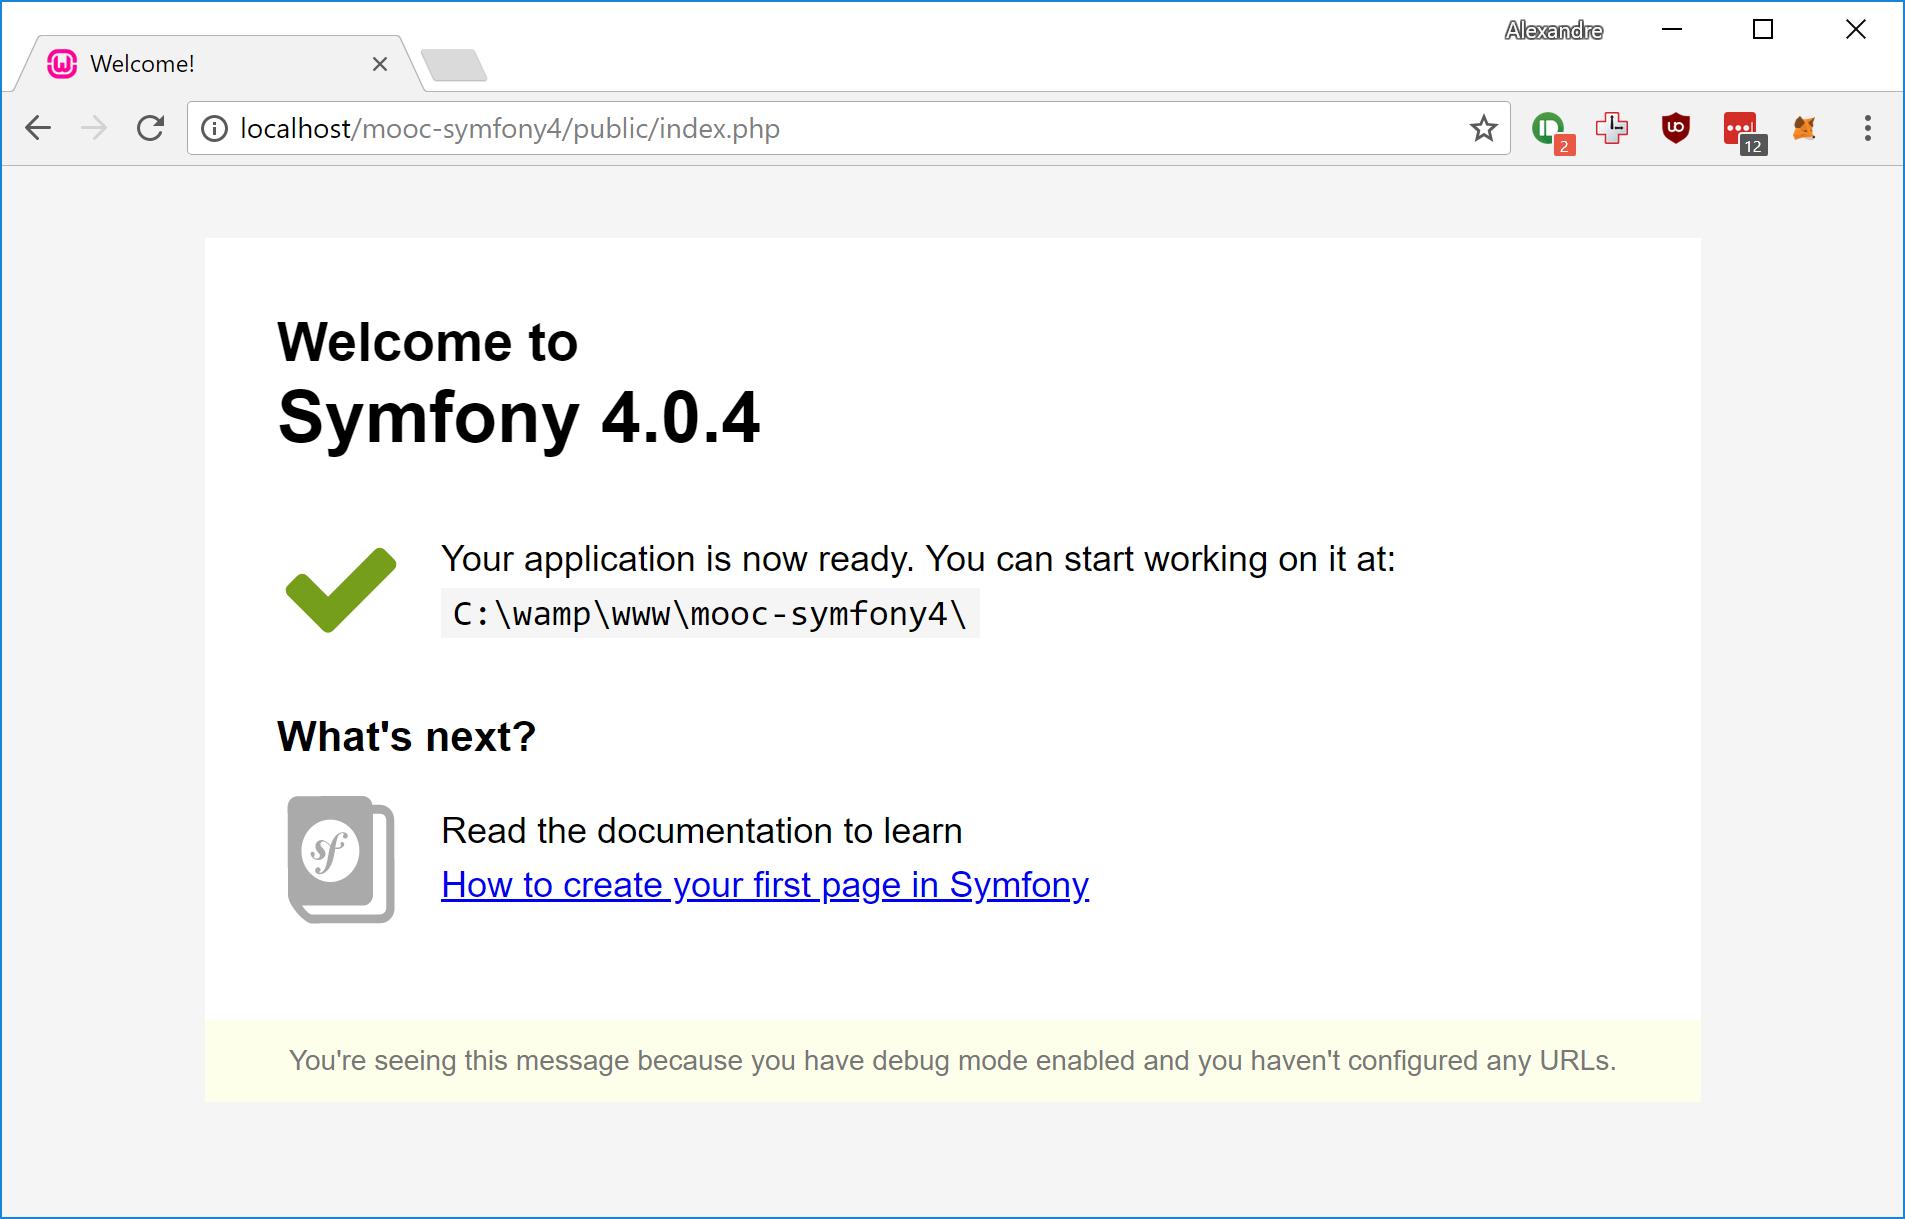 La page d'accueil de Symfony